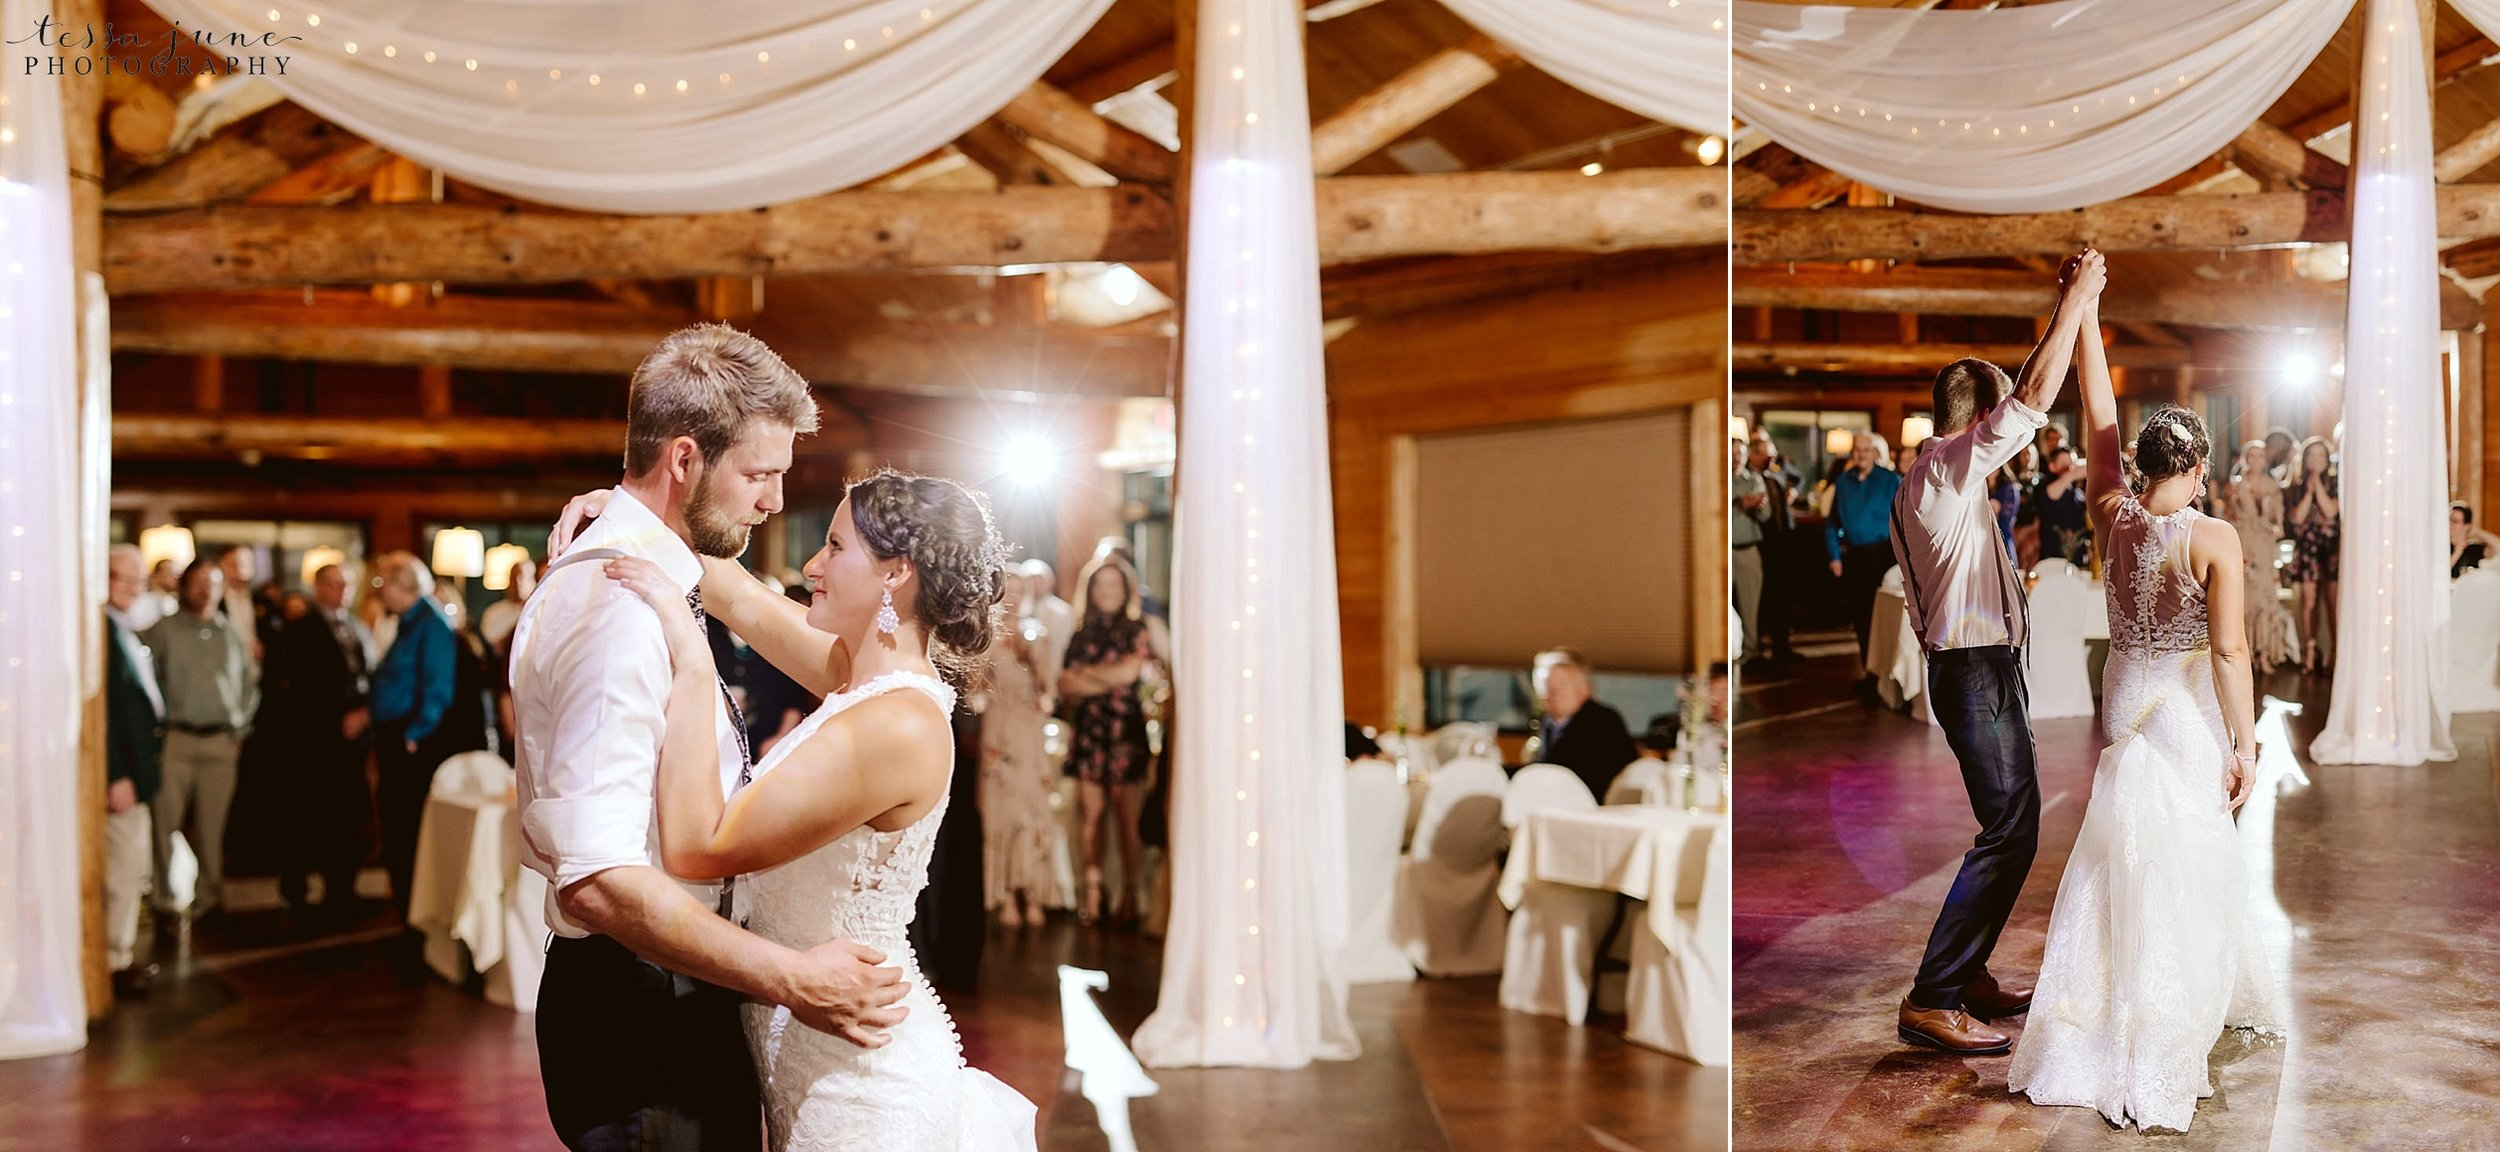 The-grands-at-mulligans-wedding-sartell-minnesota-spring-floral-spring-garden-wedding-148.jpg